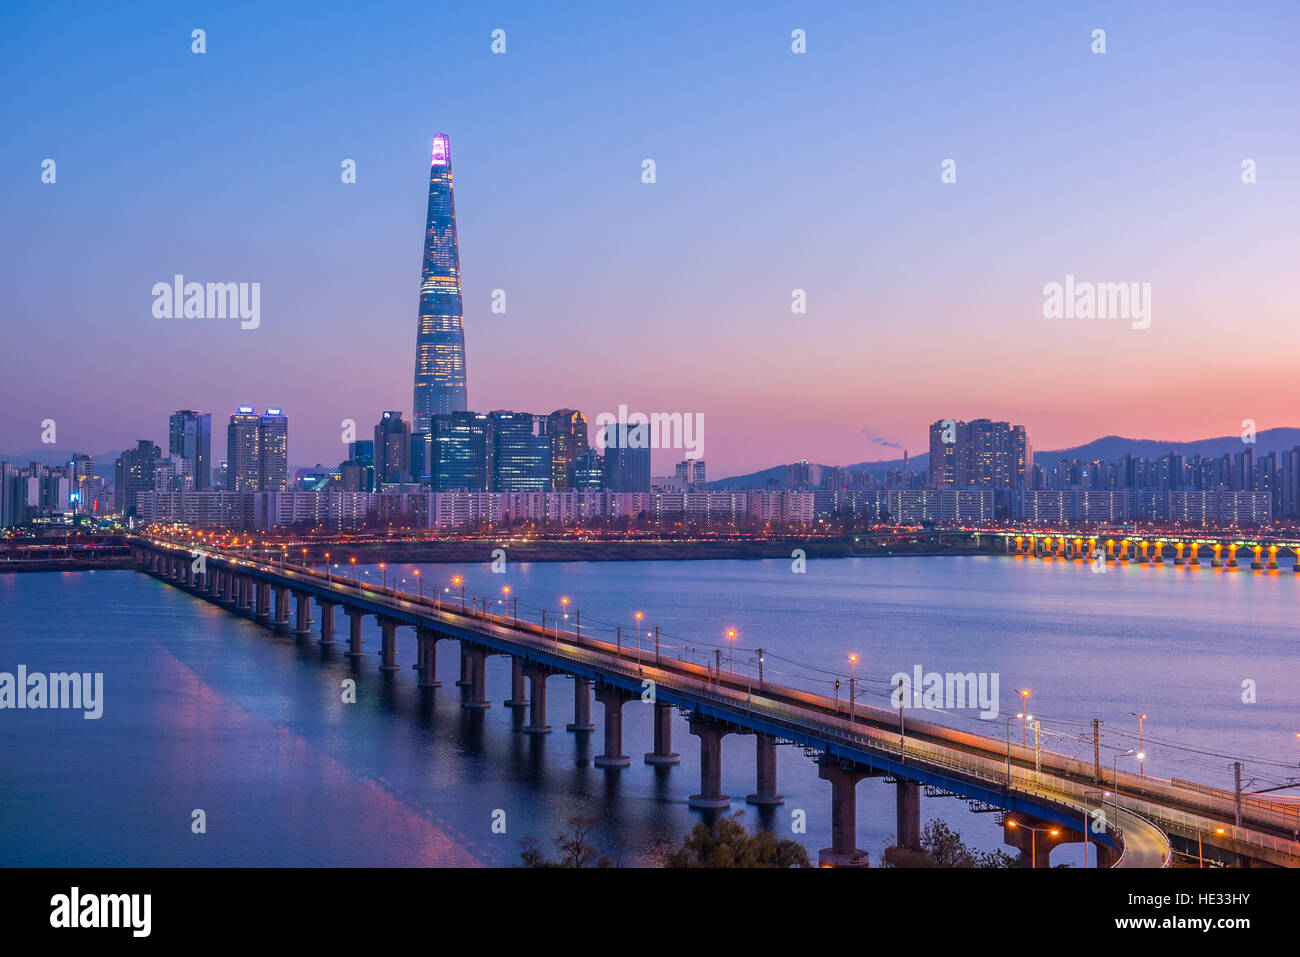 Seoul U-Bahn und Lotte Tower bei Nacht, Südkorea Stockbild